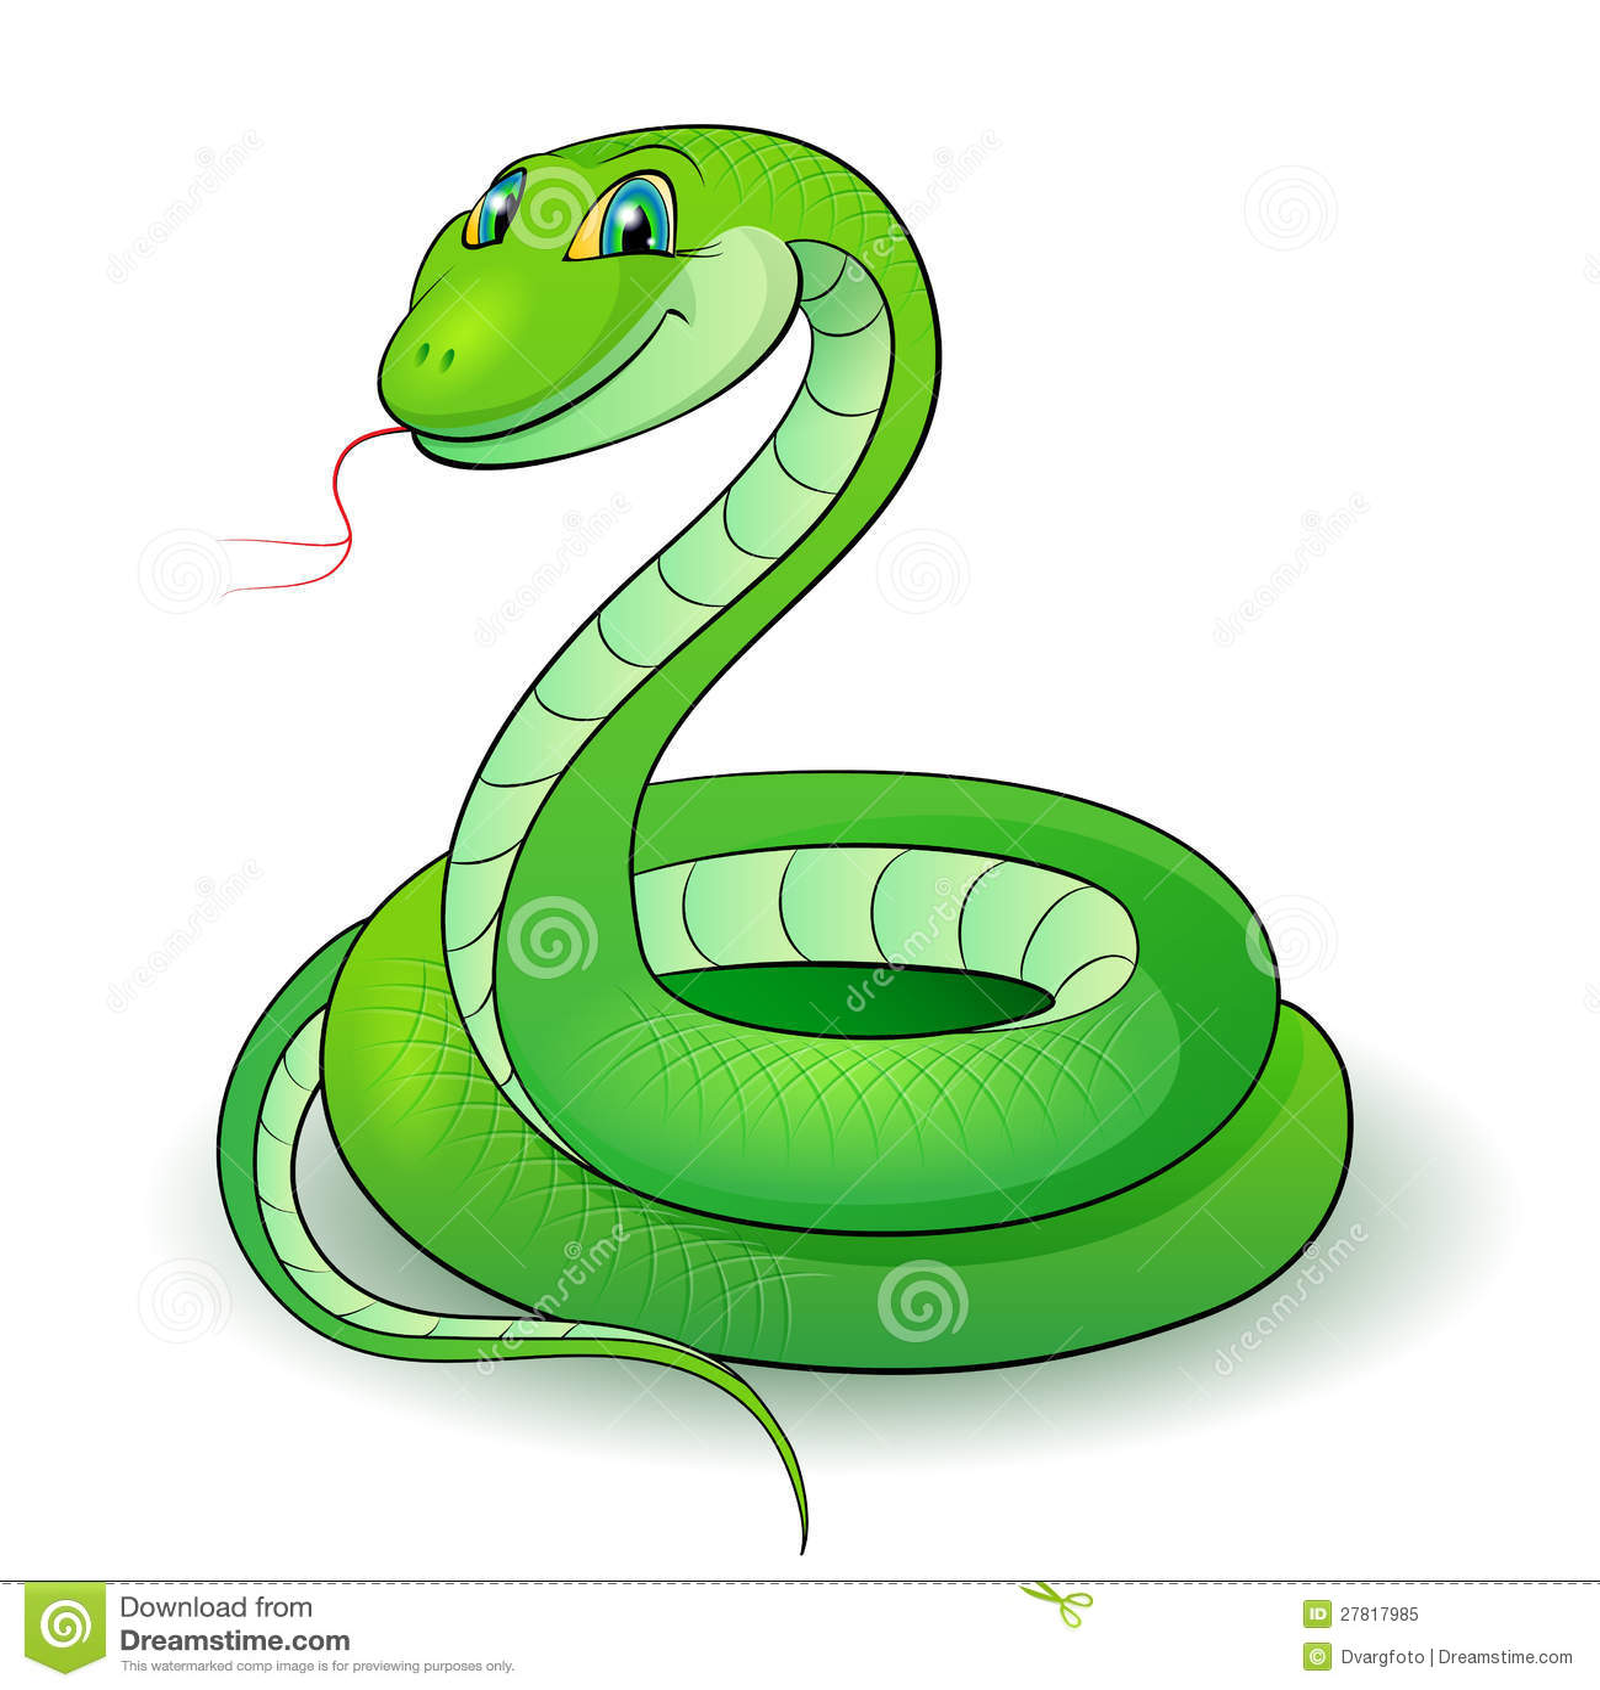 Green snake cartoon royalty free stock image image 19462406 - Serpent Vert Photo Libre De Droits